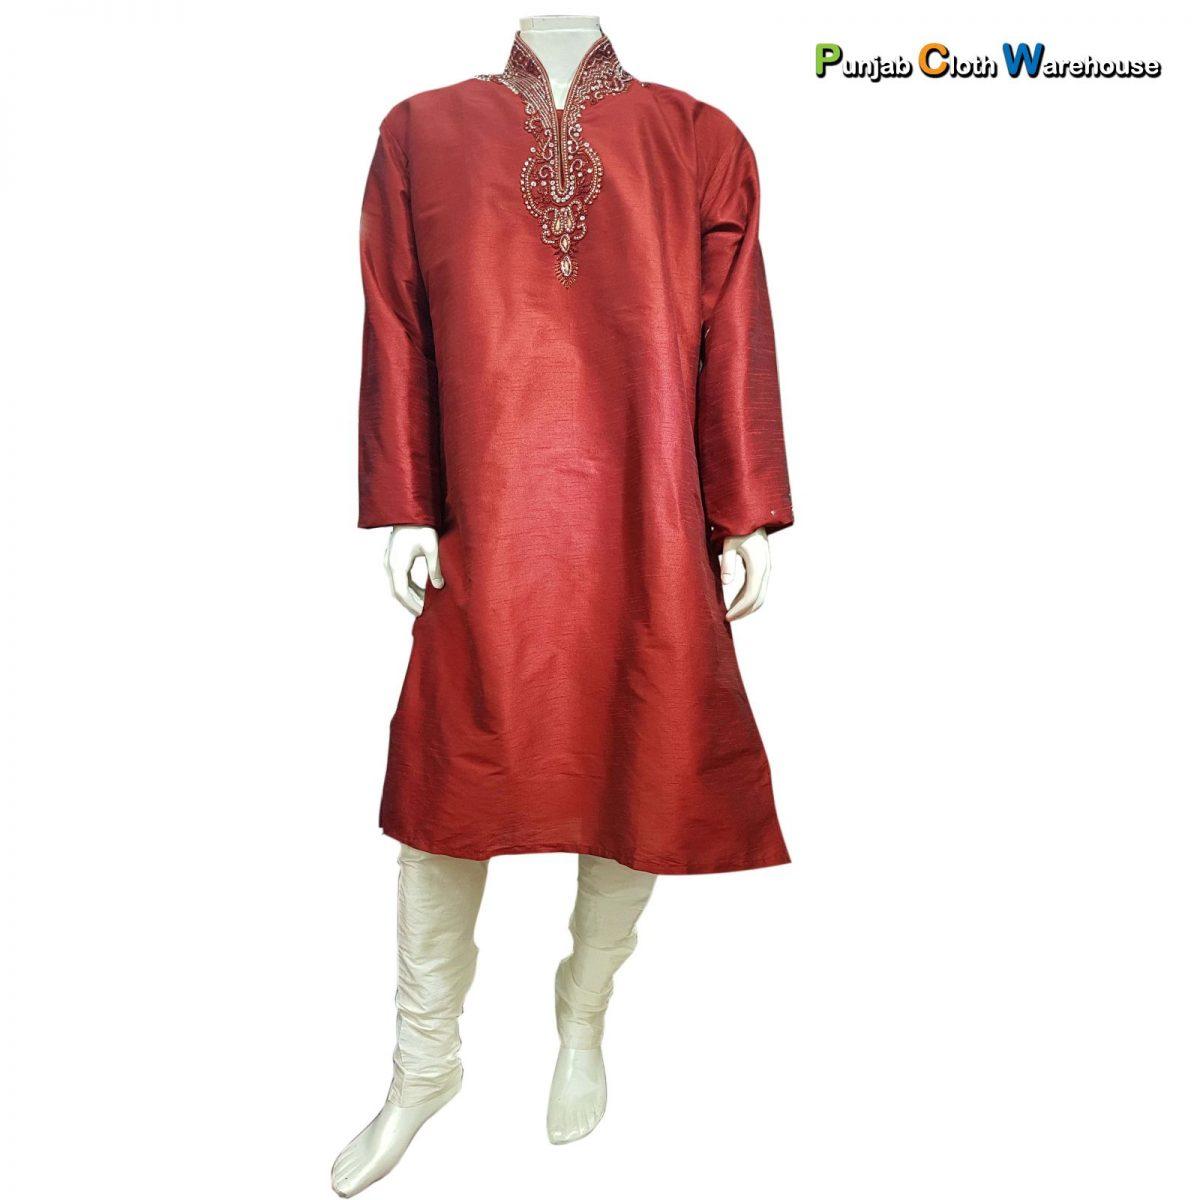 Designer Party Wear Suits, Sarees, Lehengas & Sherwanis (43)